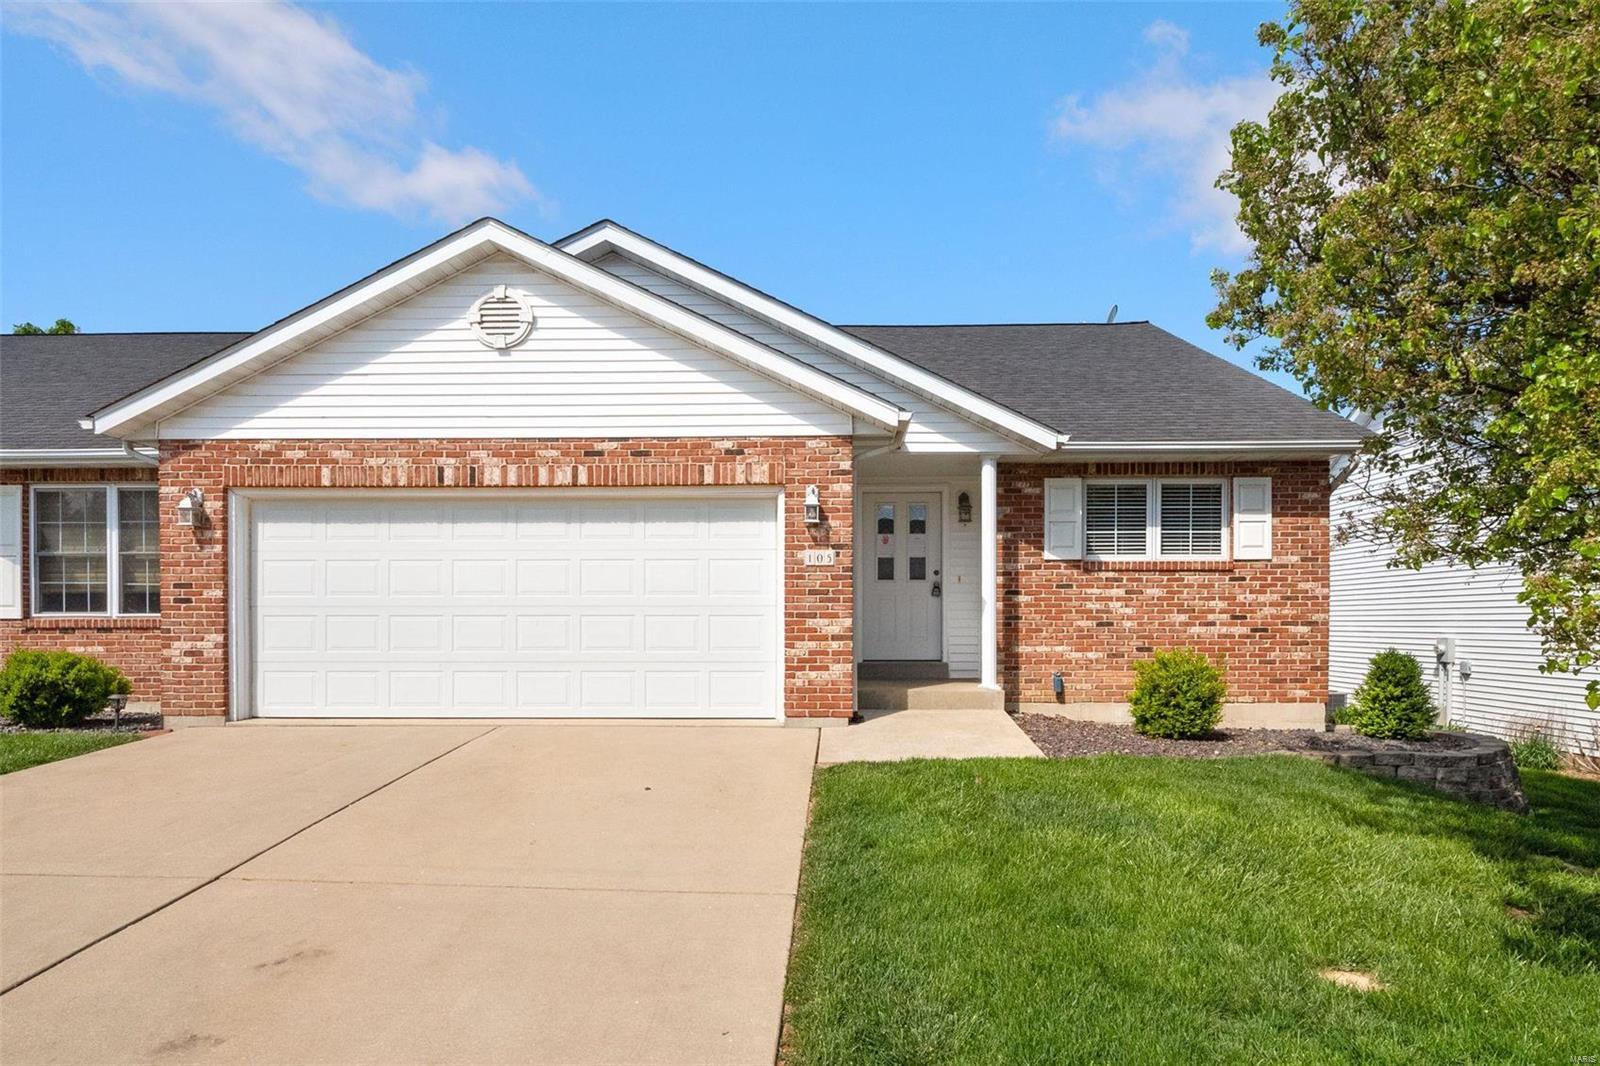 105 Megan Court Property Photo - Valmeyer, IL real estate listing